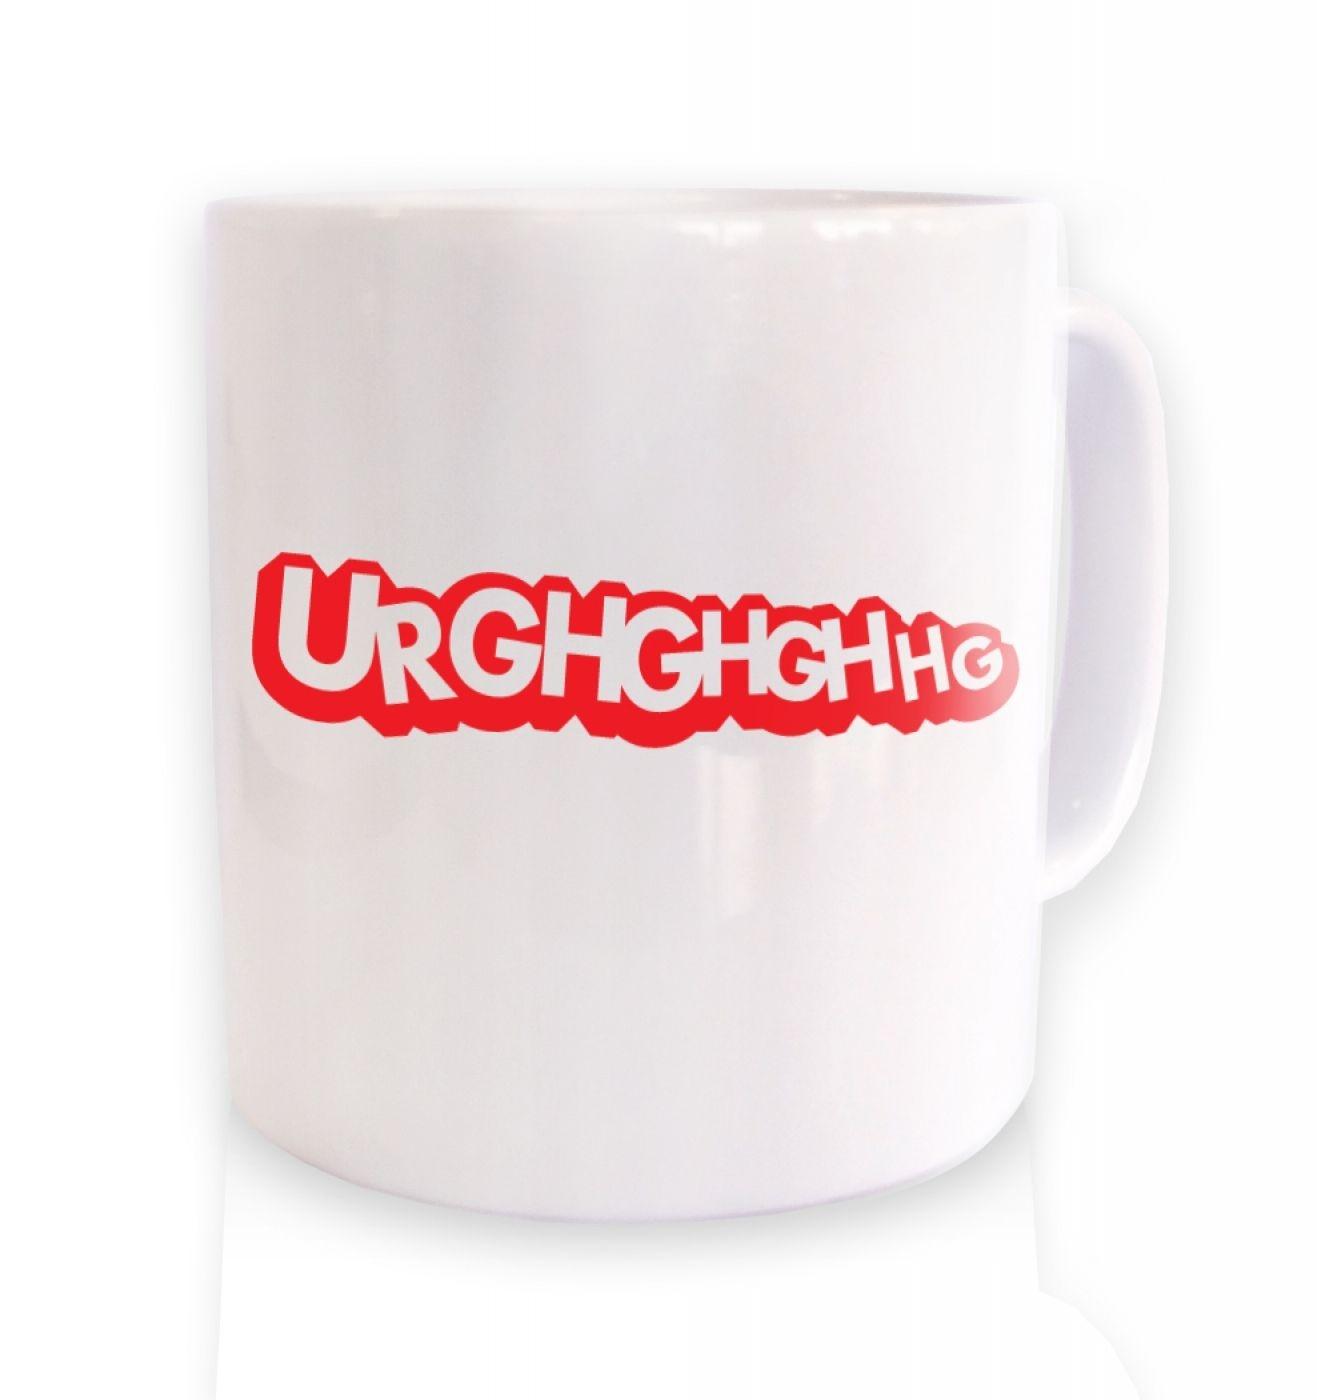 Urghghghgh ceramic coffee mug